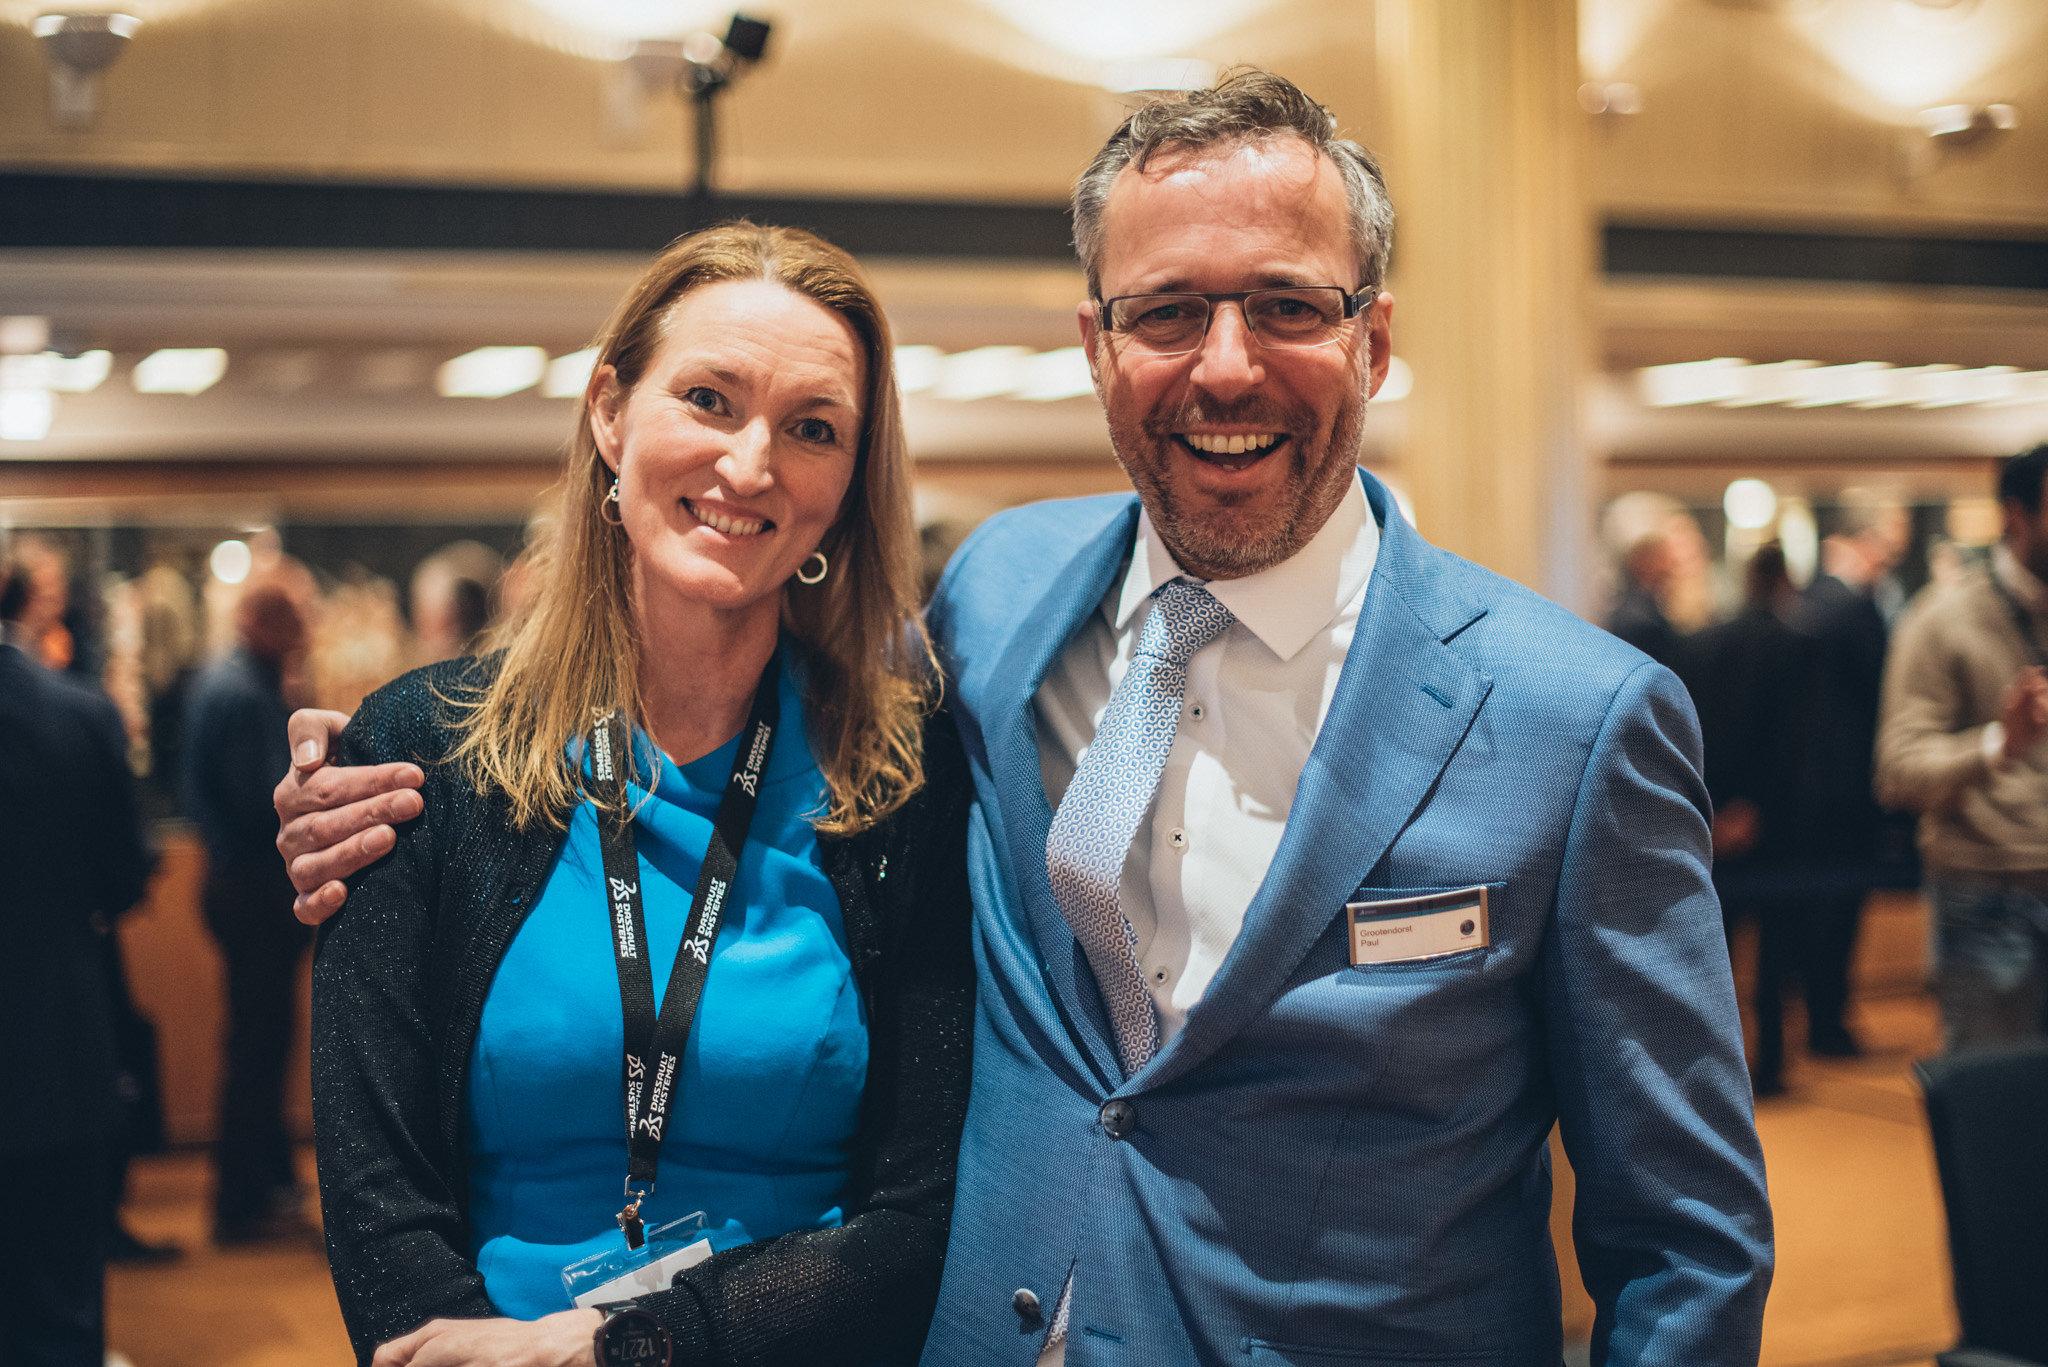 3DX_forum_event_highlights_rotterdam_networking-42.jpg